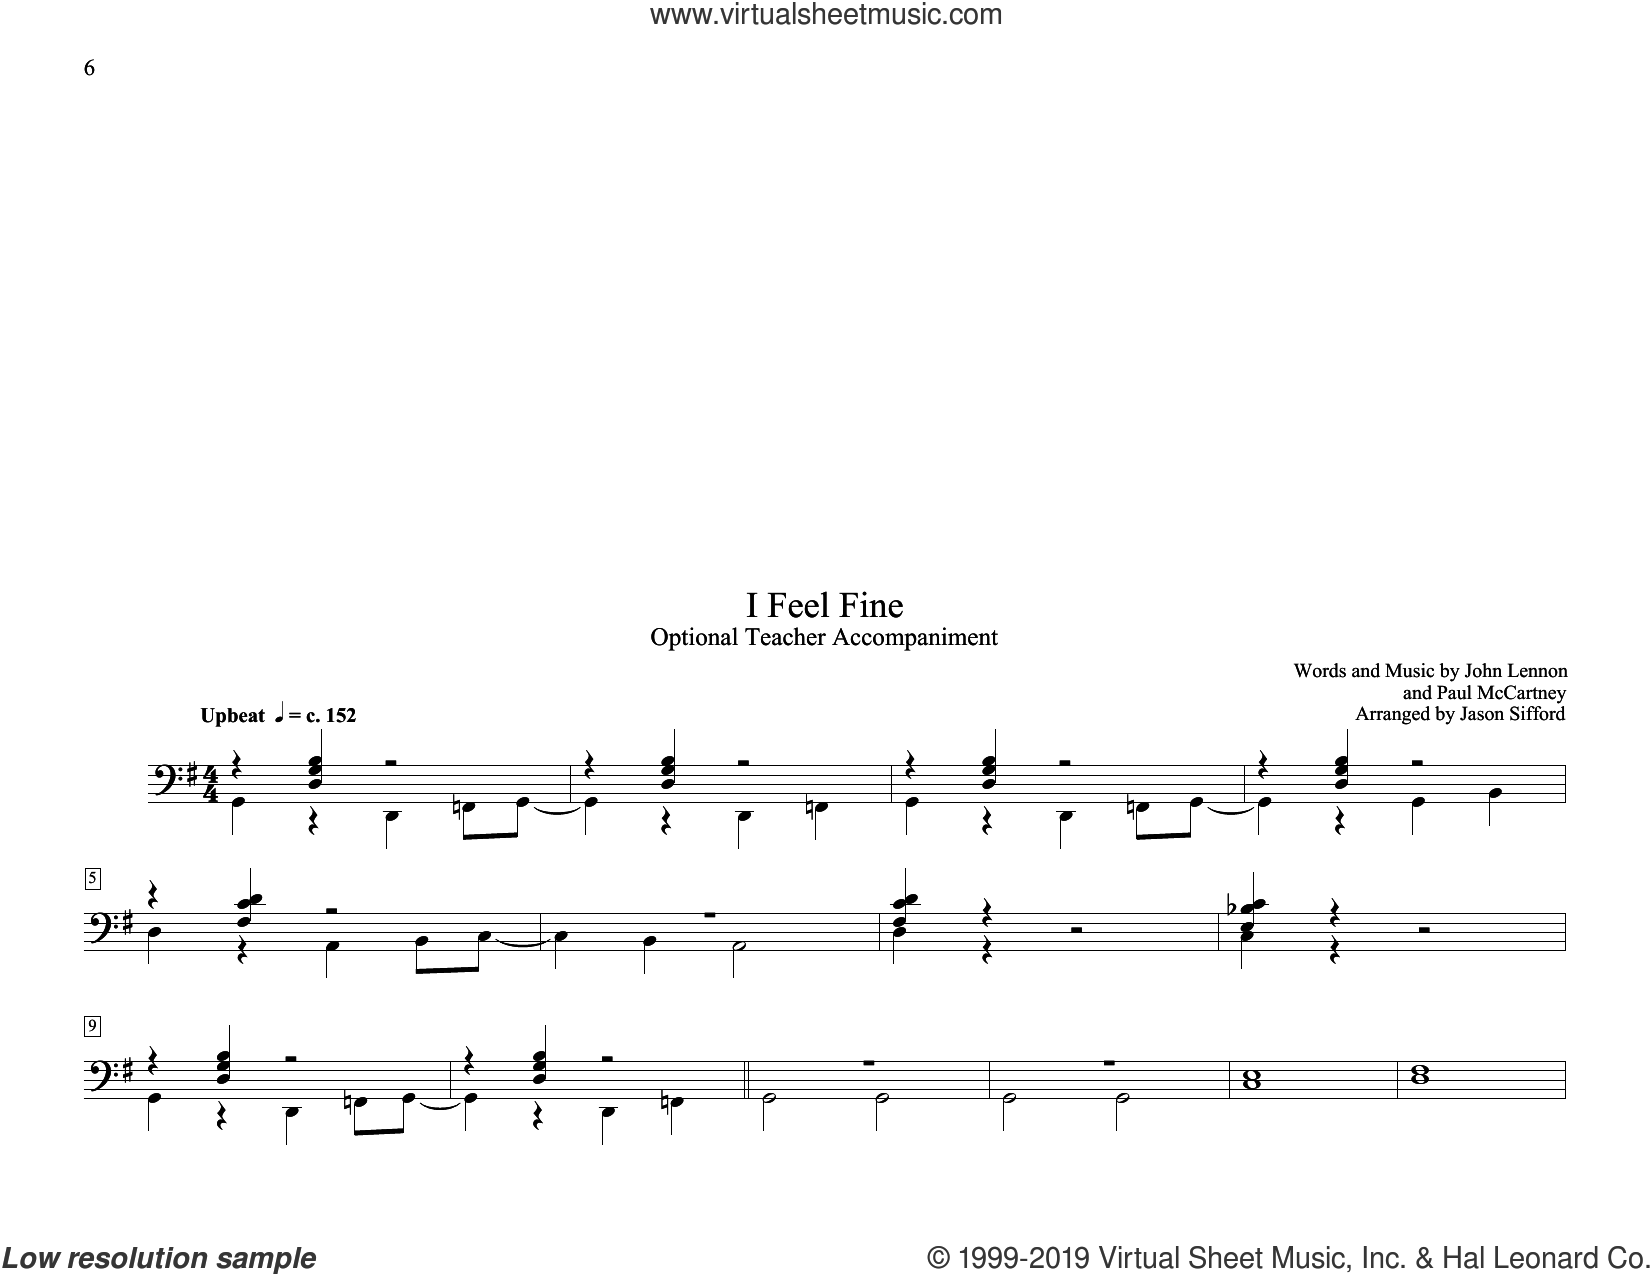 I Feel Fine (arr. Jason Sifford) sheet music for piano solo (elementary) by The Beatles, Jason Sifford, John Lennon and Paul McCartney, beginner piano (elementary)